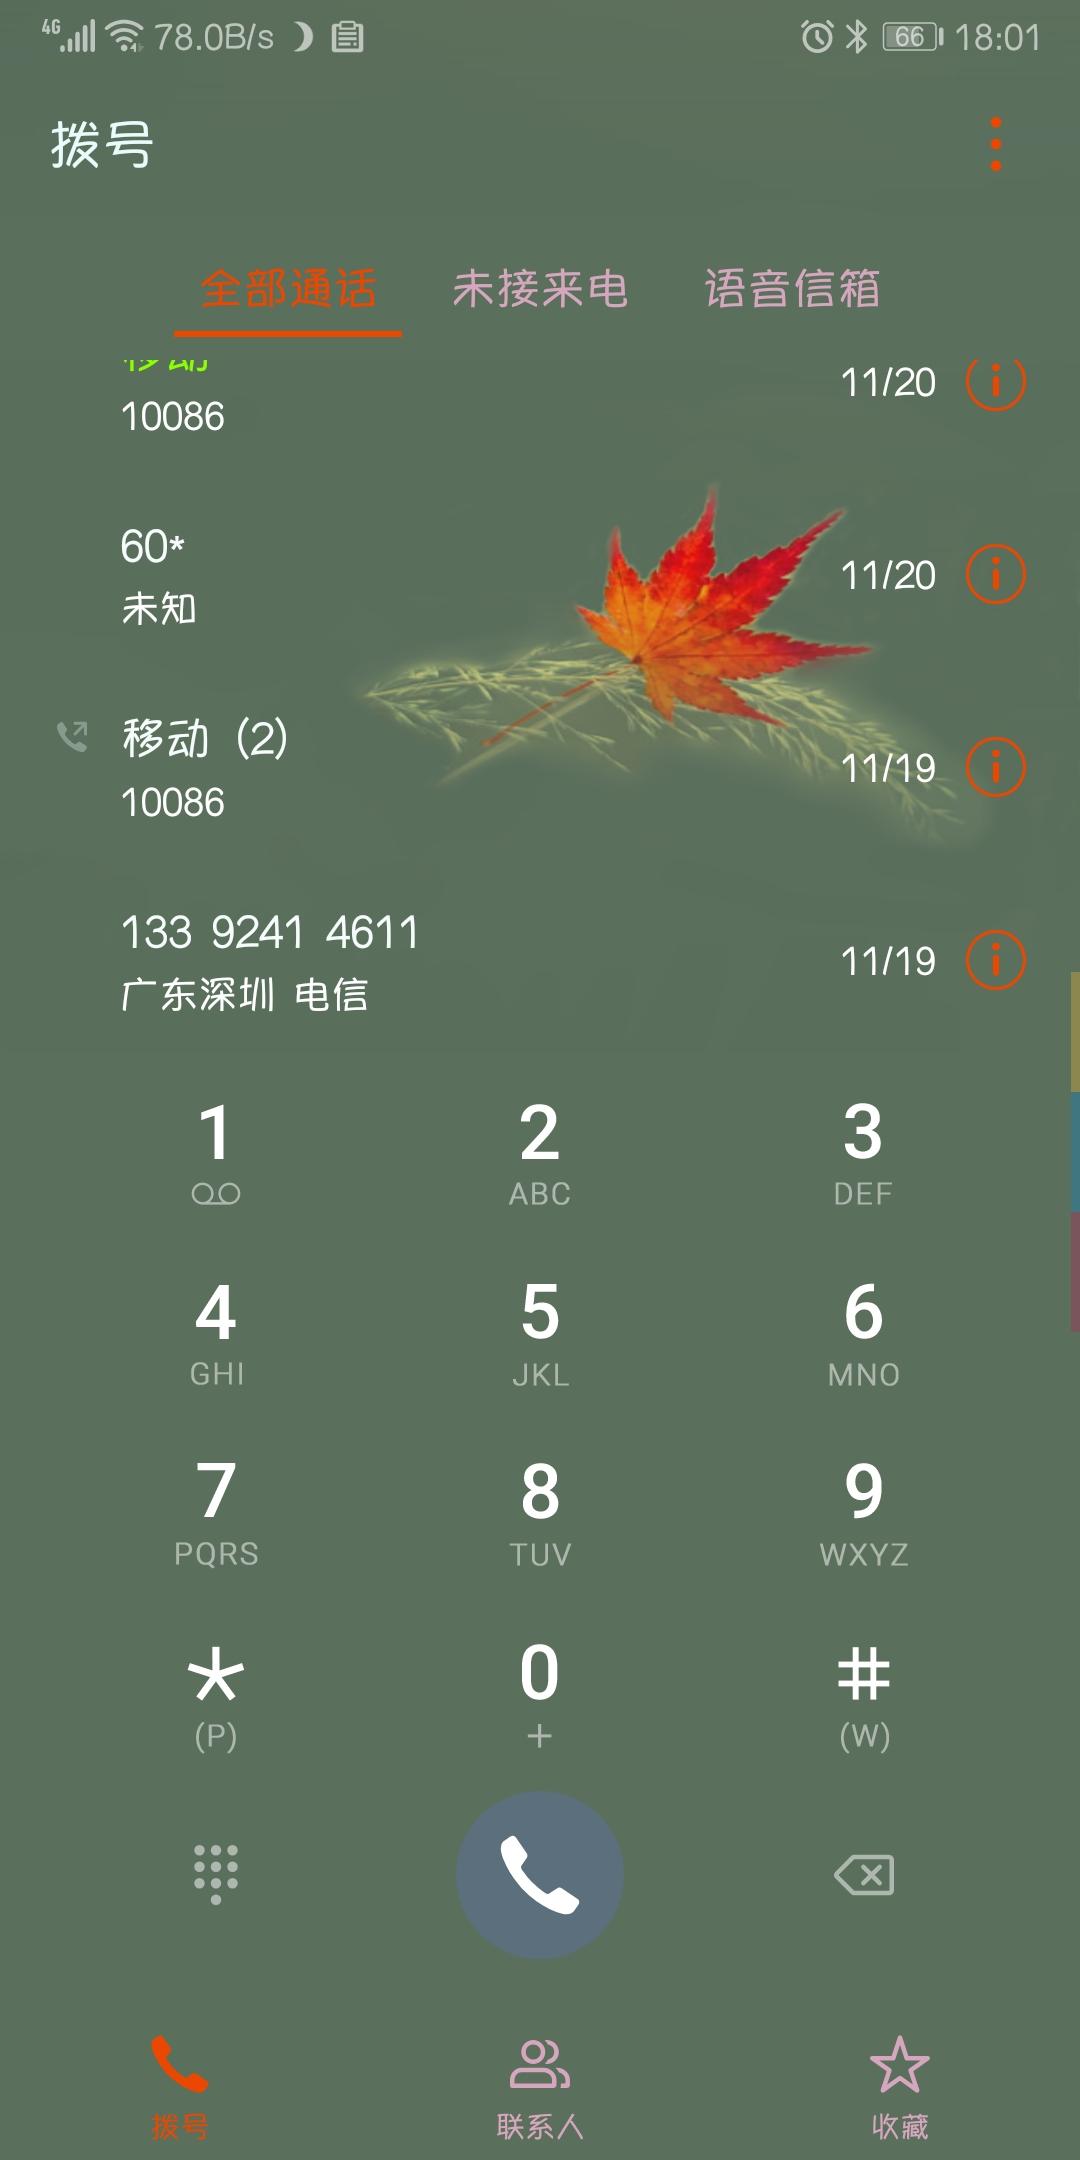 Screenshot_20181214_180139_com.android.contacts.jpg